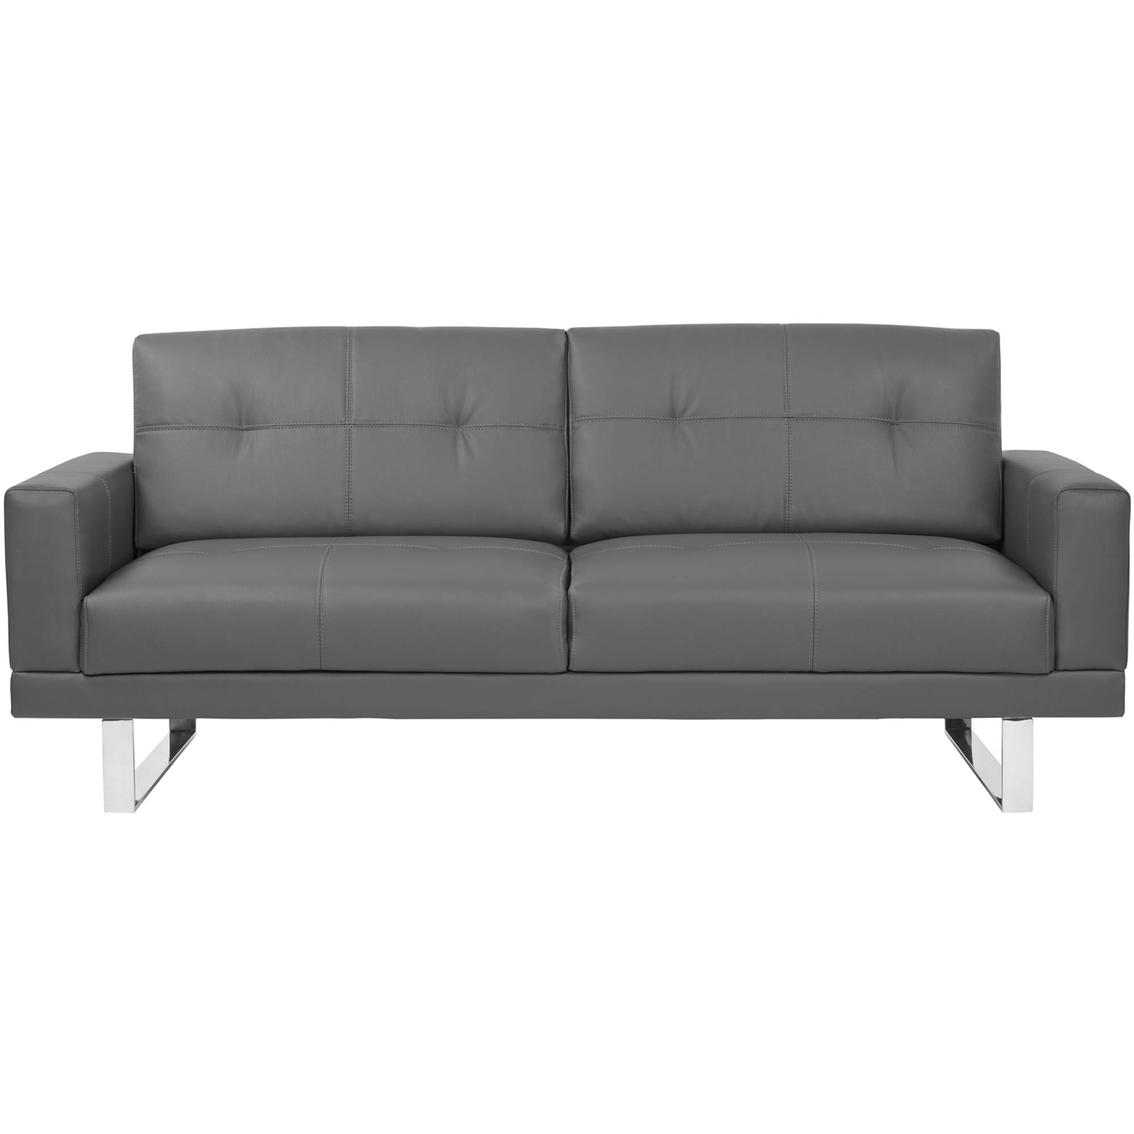 Armen Living Lincoln Sofa